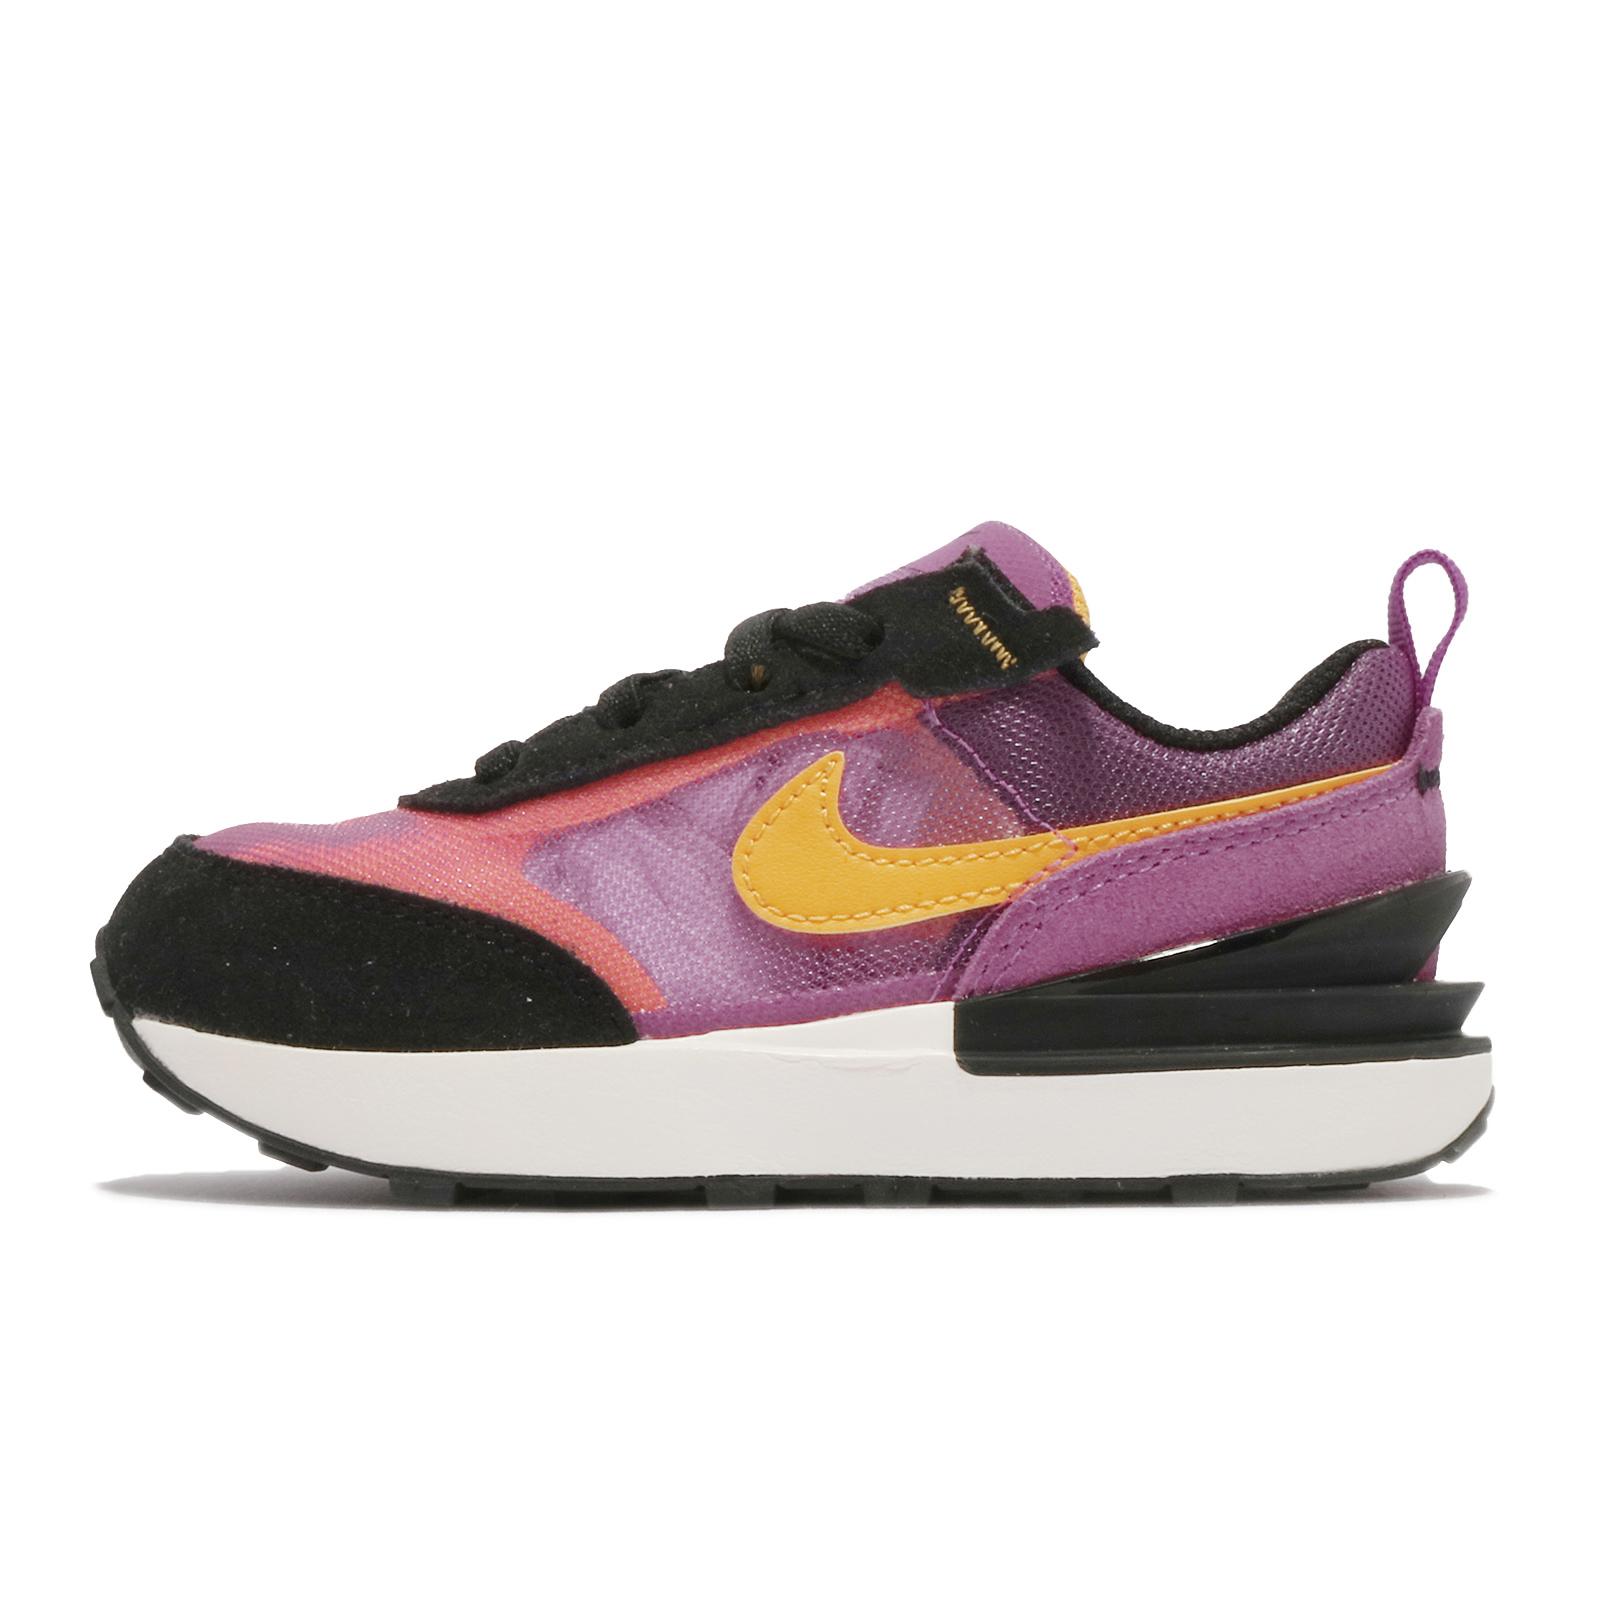 Nike 小童鞋 Waffle One TD 紫 桃紅 黃 嬰幼童 小Sacai 親子鞋【ACS】 DC0479-600